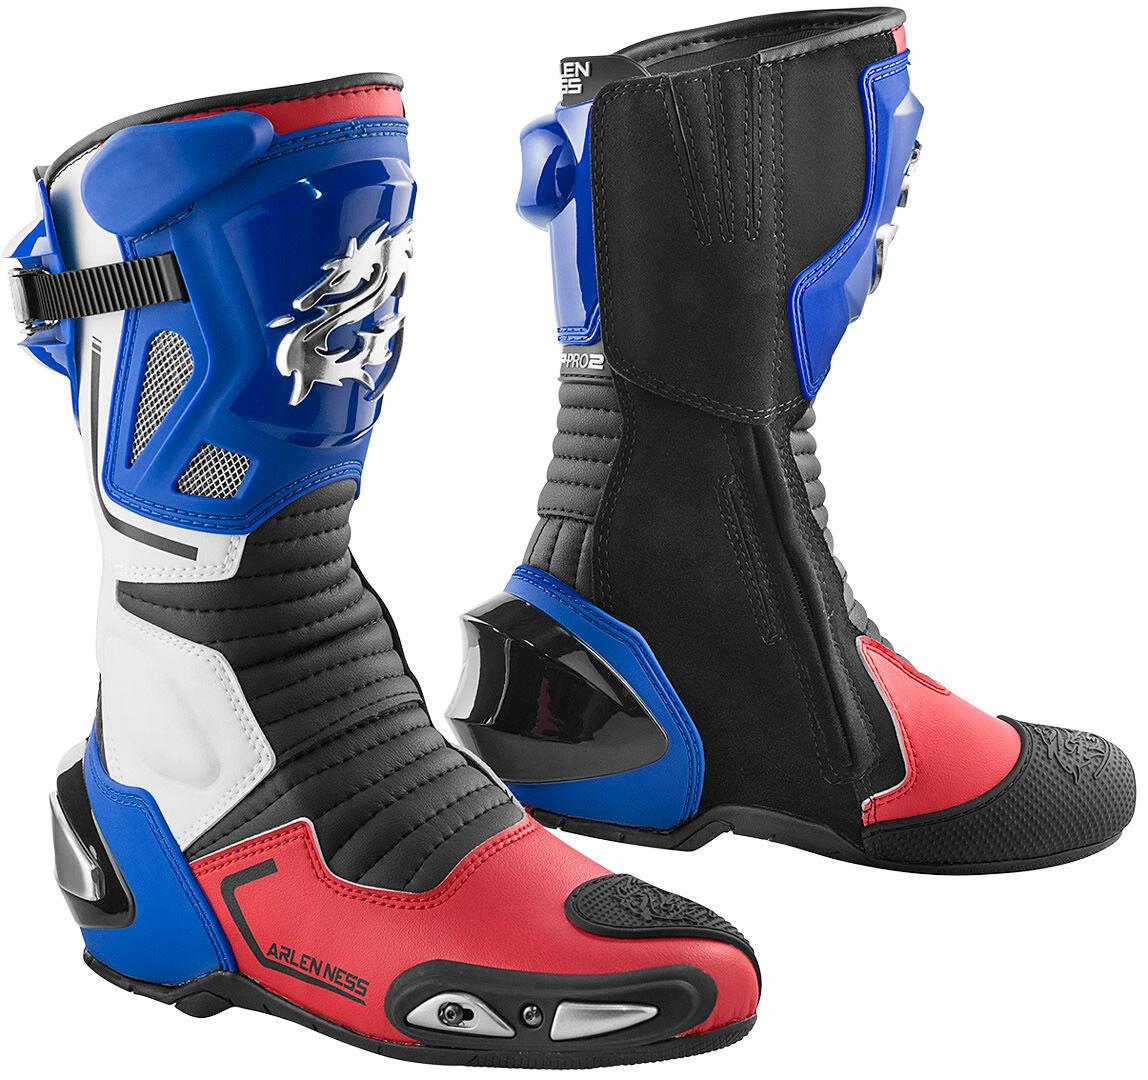 Arlen Ness Sugello Bottes de moto Blanc Rouge Bleu taille : 41